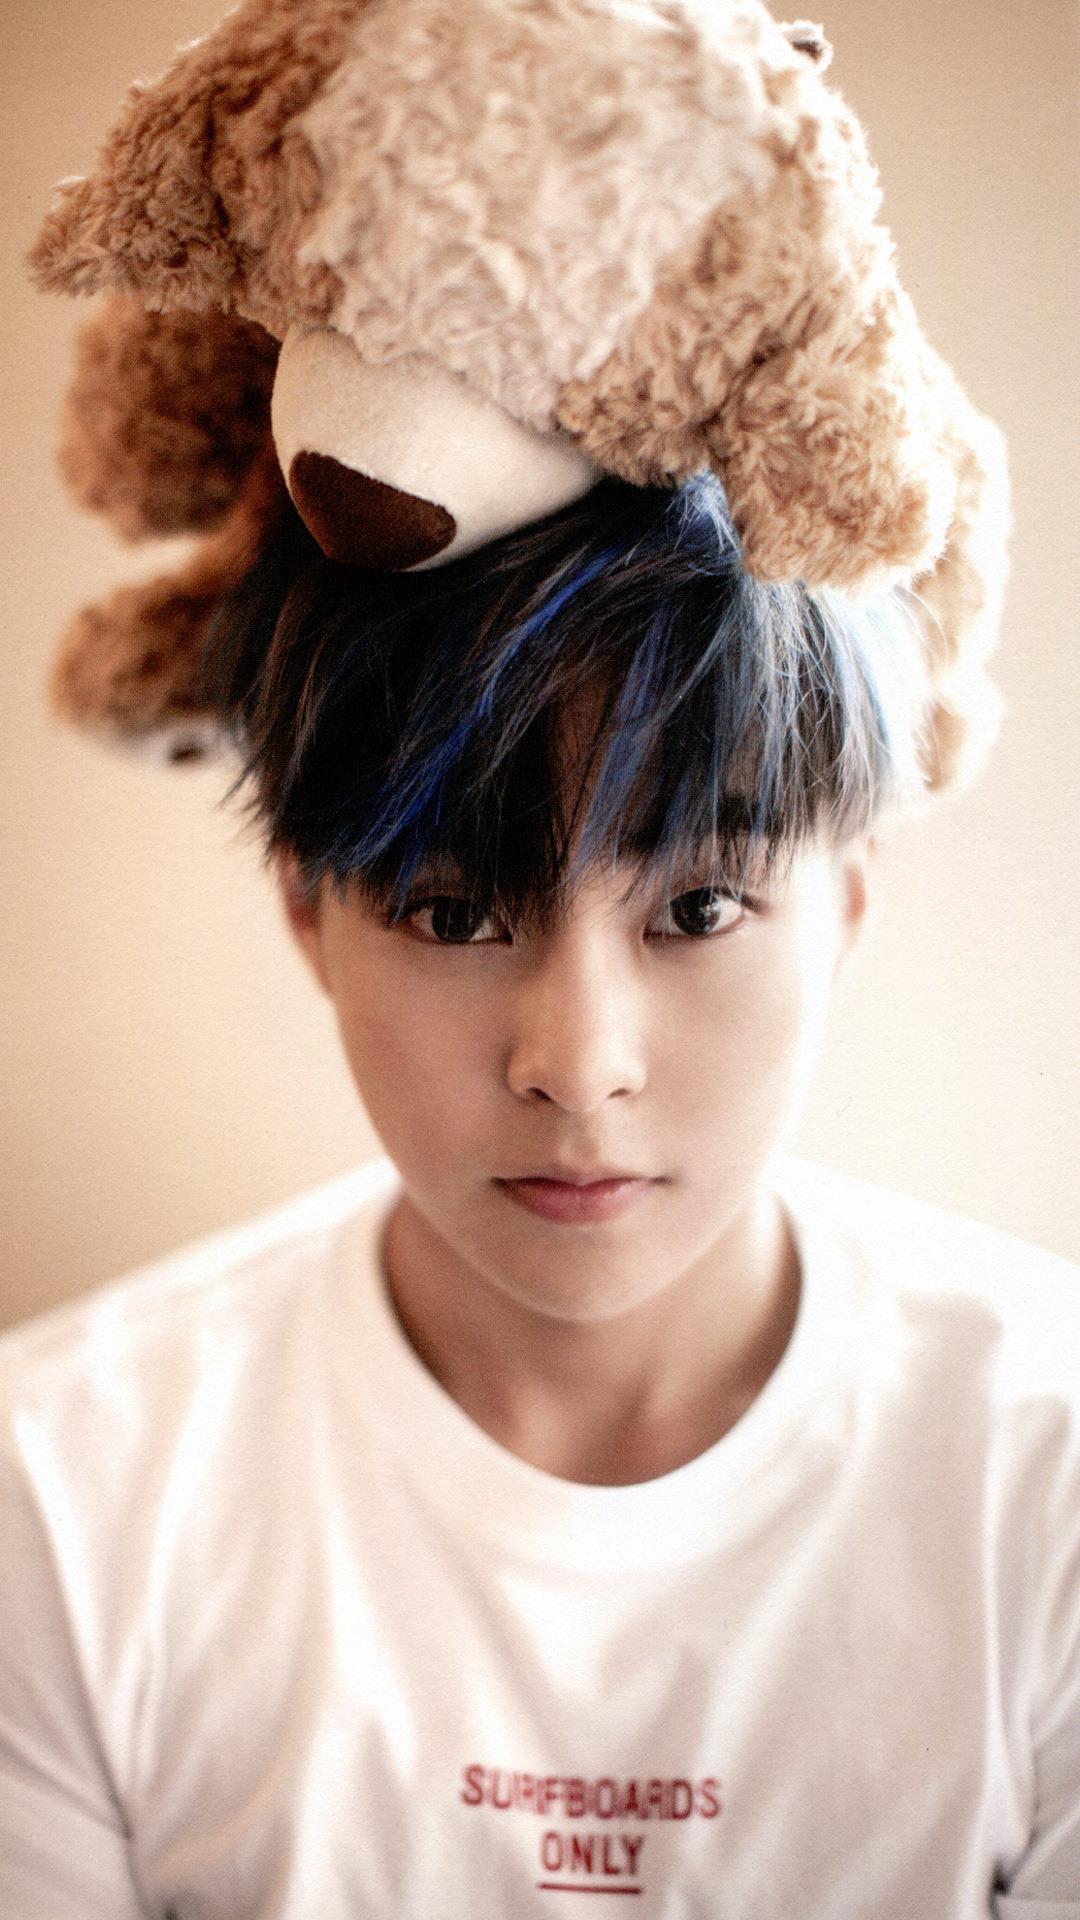 Xiumin Cute : xiumin, Kpop//Khh//Kdrama, Lockscreens, Wallpapers, Xiumin, Phone, Requested, By...